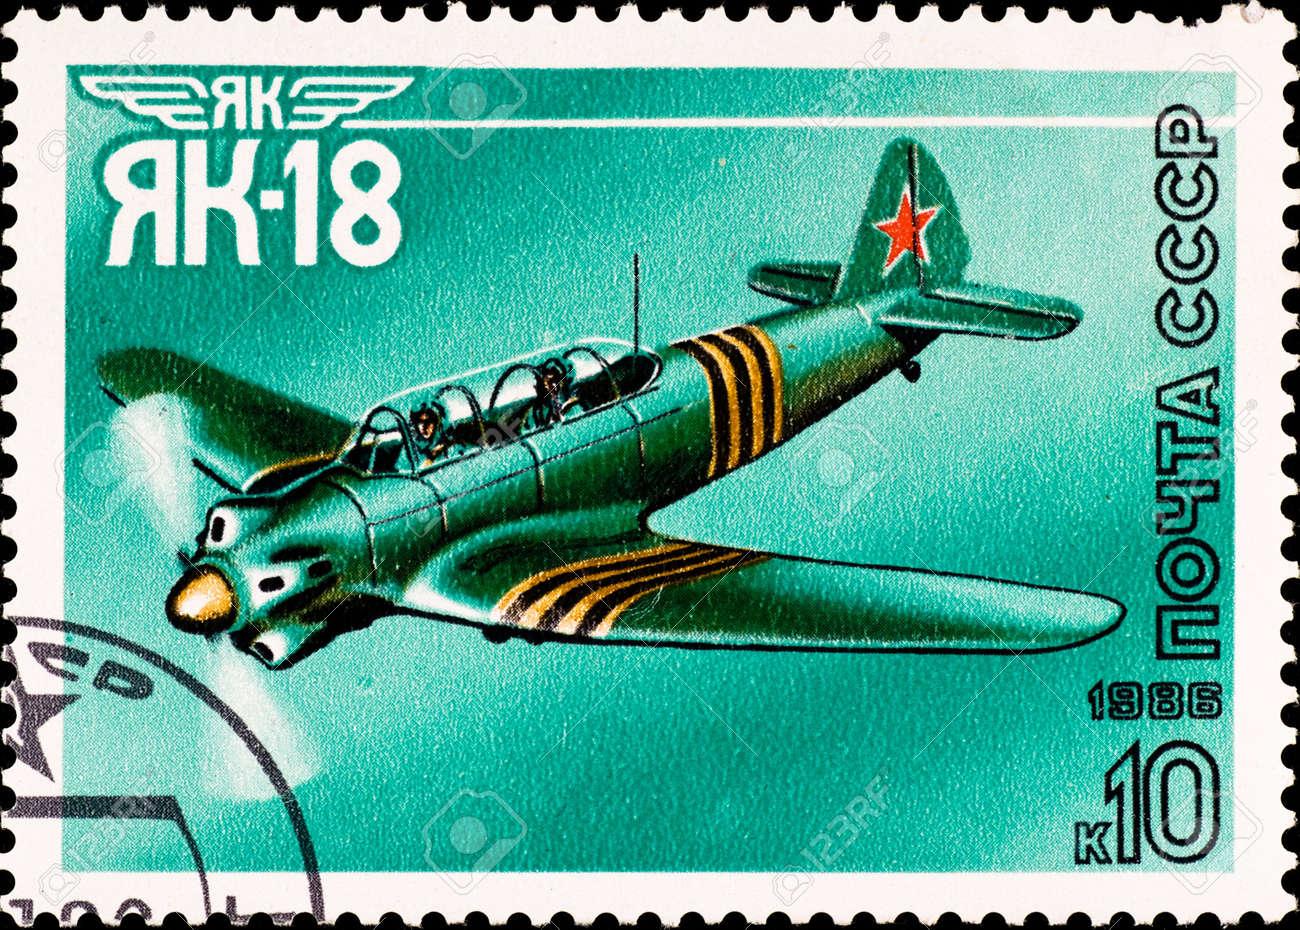 USSR - CIRCA 1986: postage stamp shows vintage rare plane